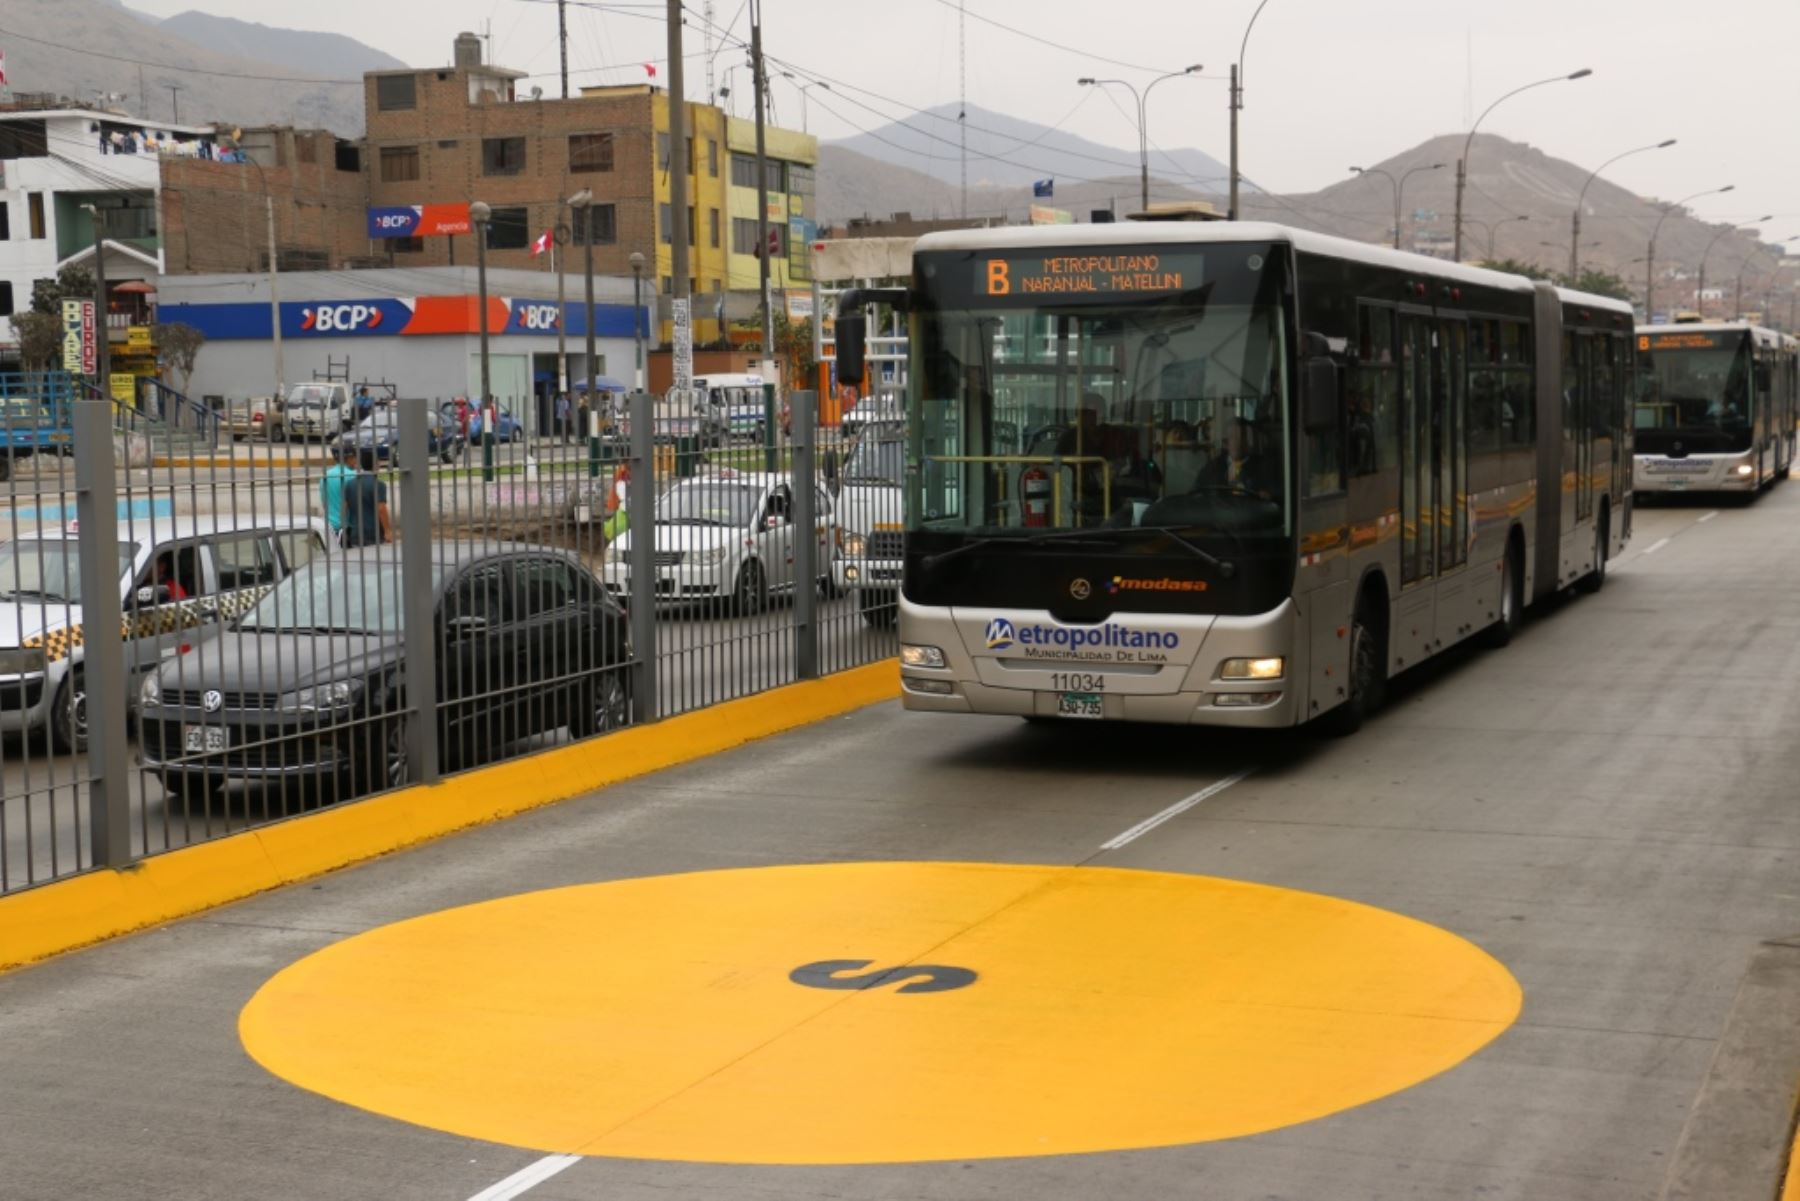 Buses del Metropolitano se detendrán 10 minutos durante simulacro de sismo. Foto: ANDINA/Difusión.